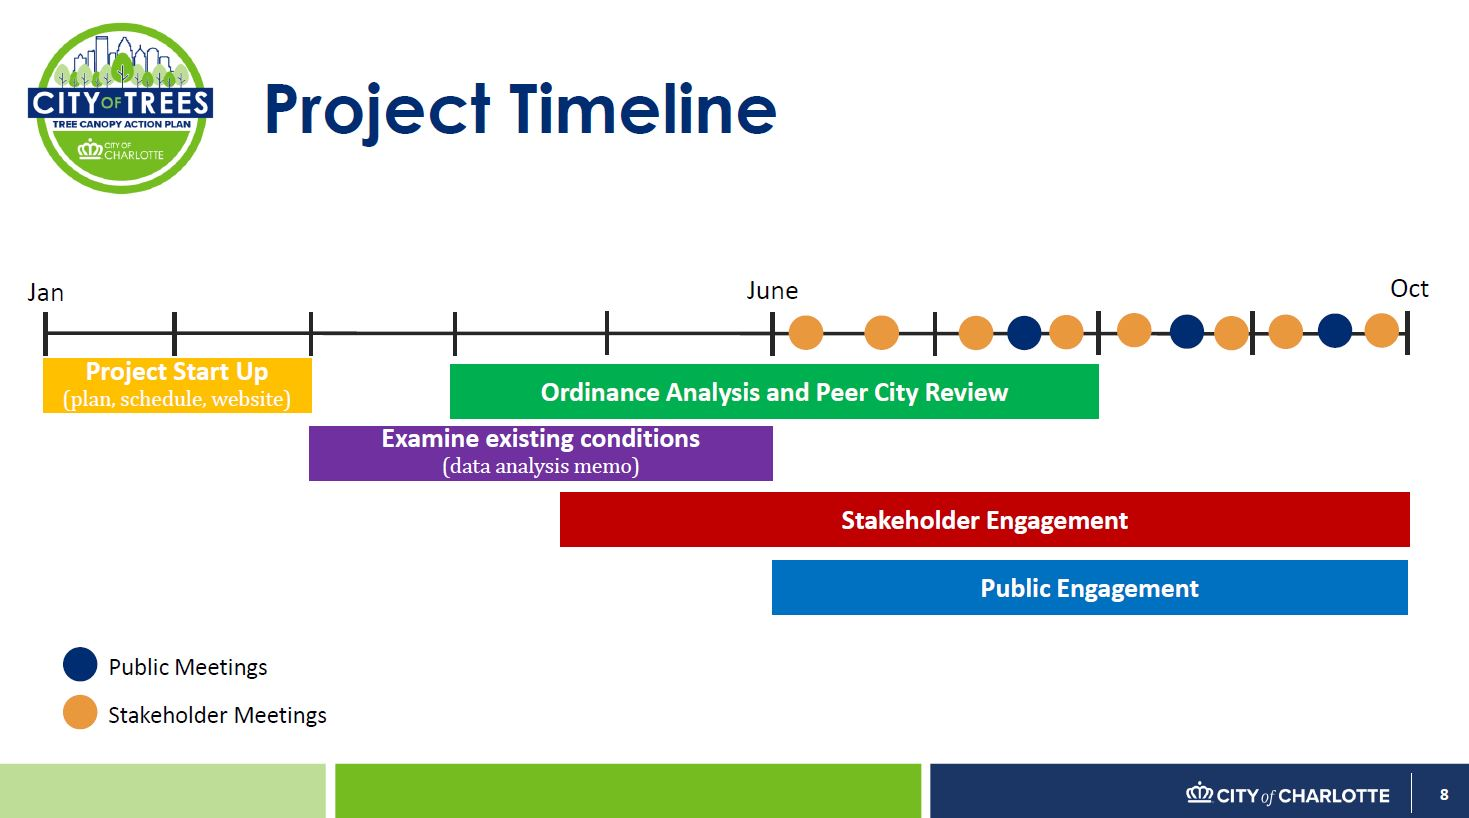 Tree_engagement_timeline.JPG